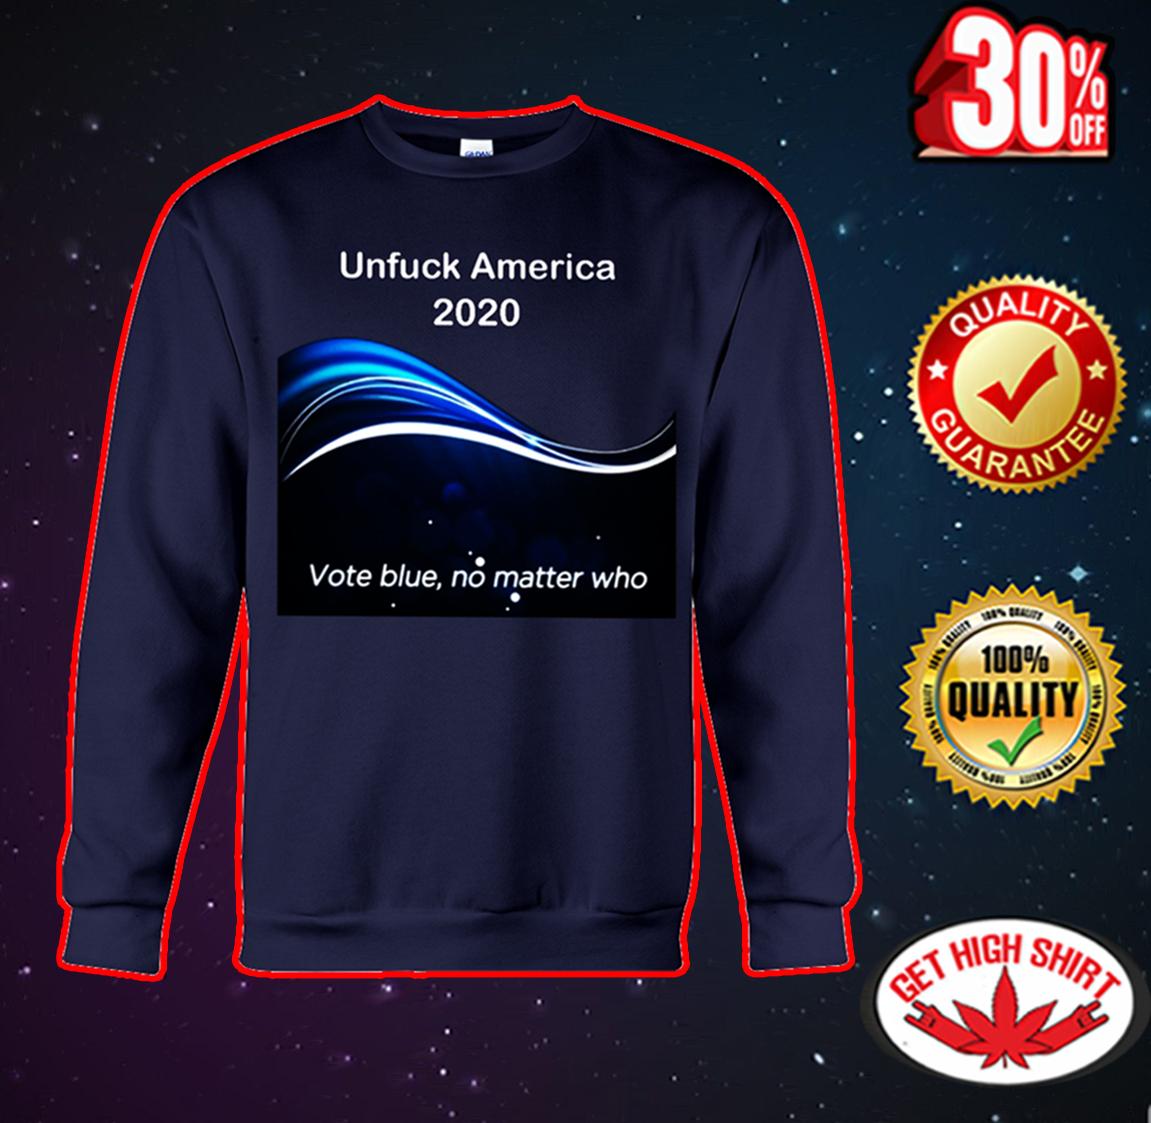 Unfuck America 2020 vote blue no matter who sweatshirt